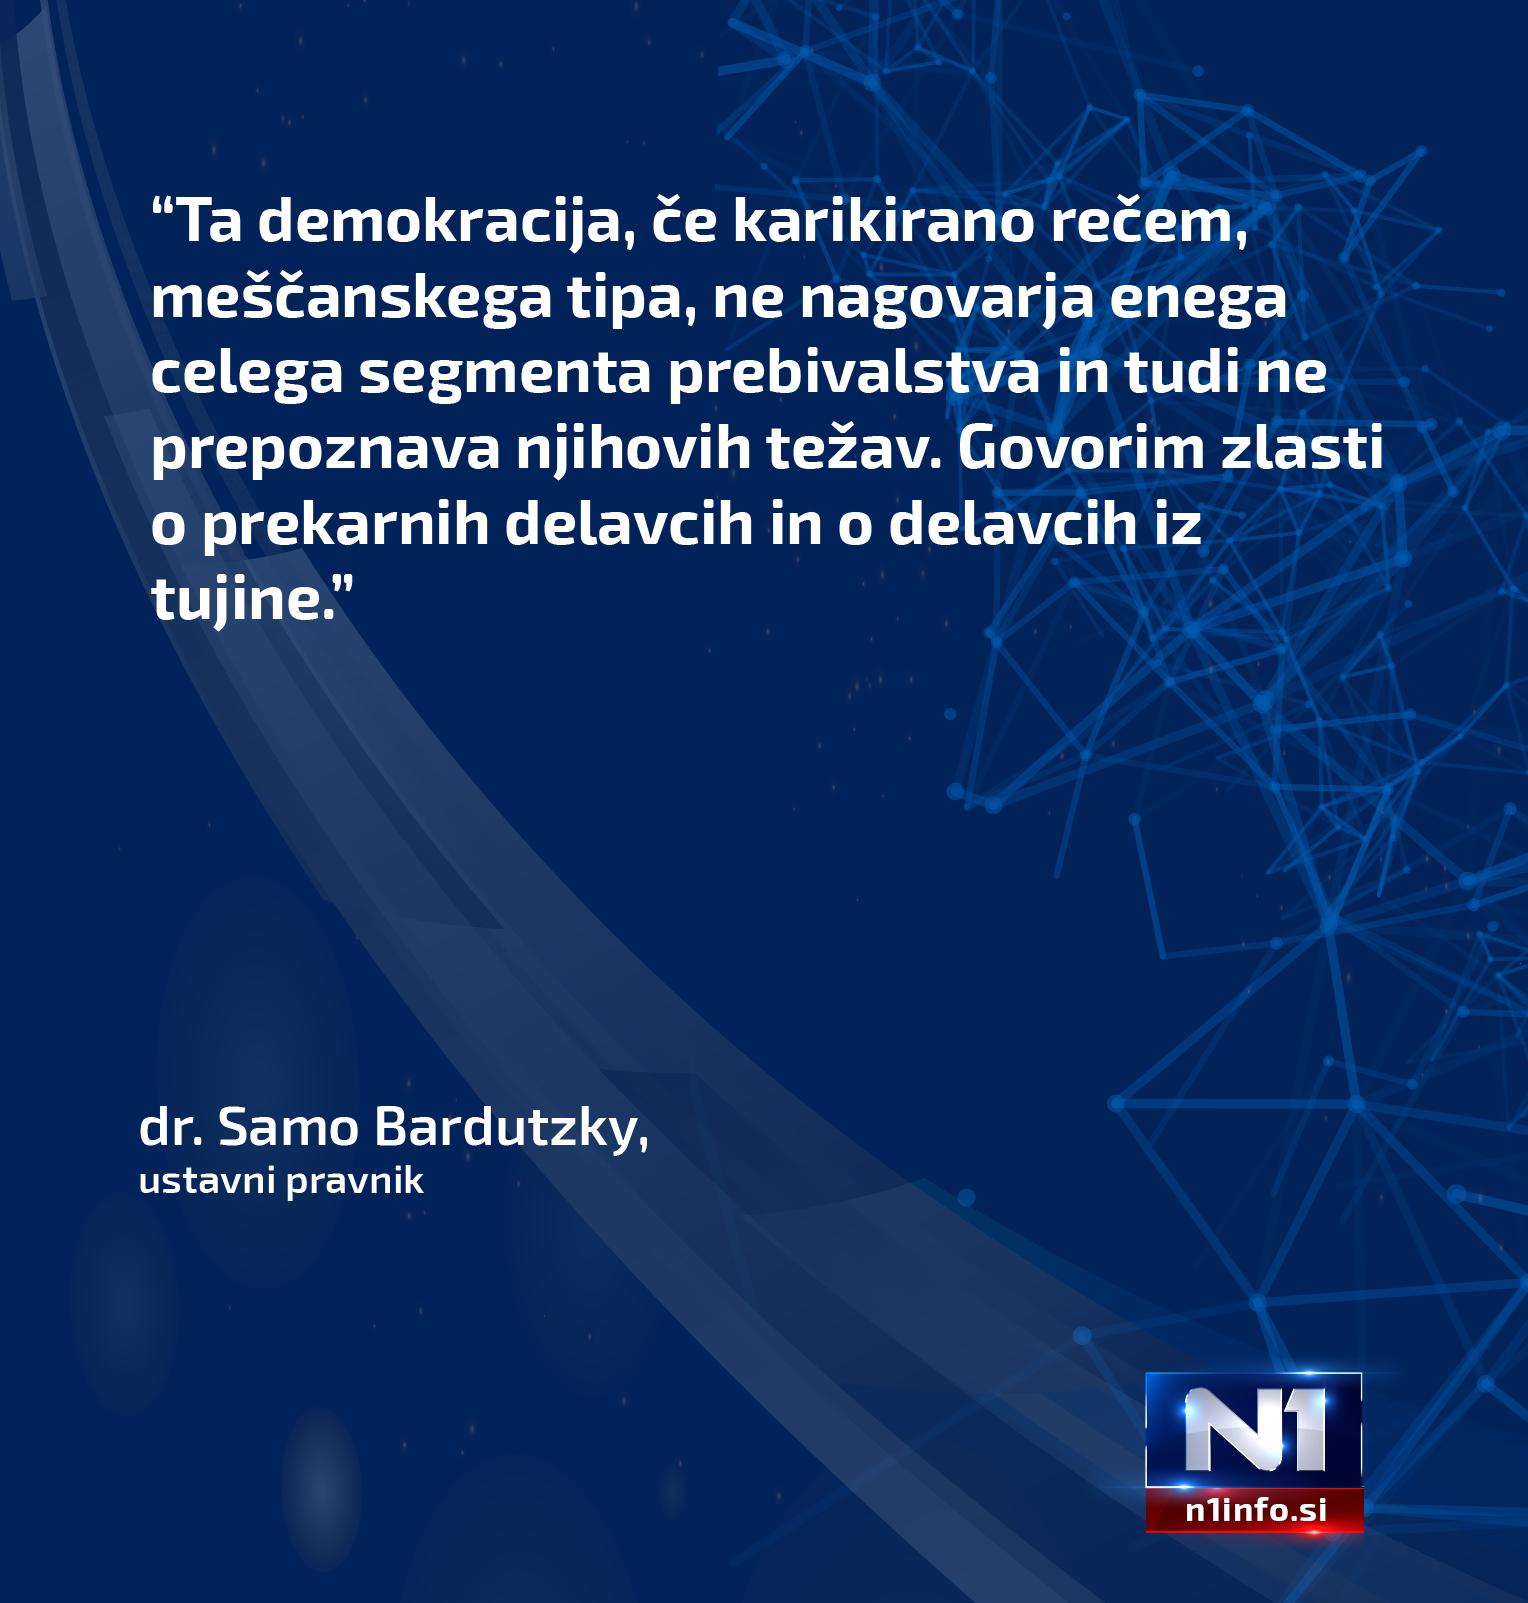 Bardutzky